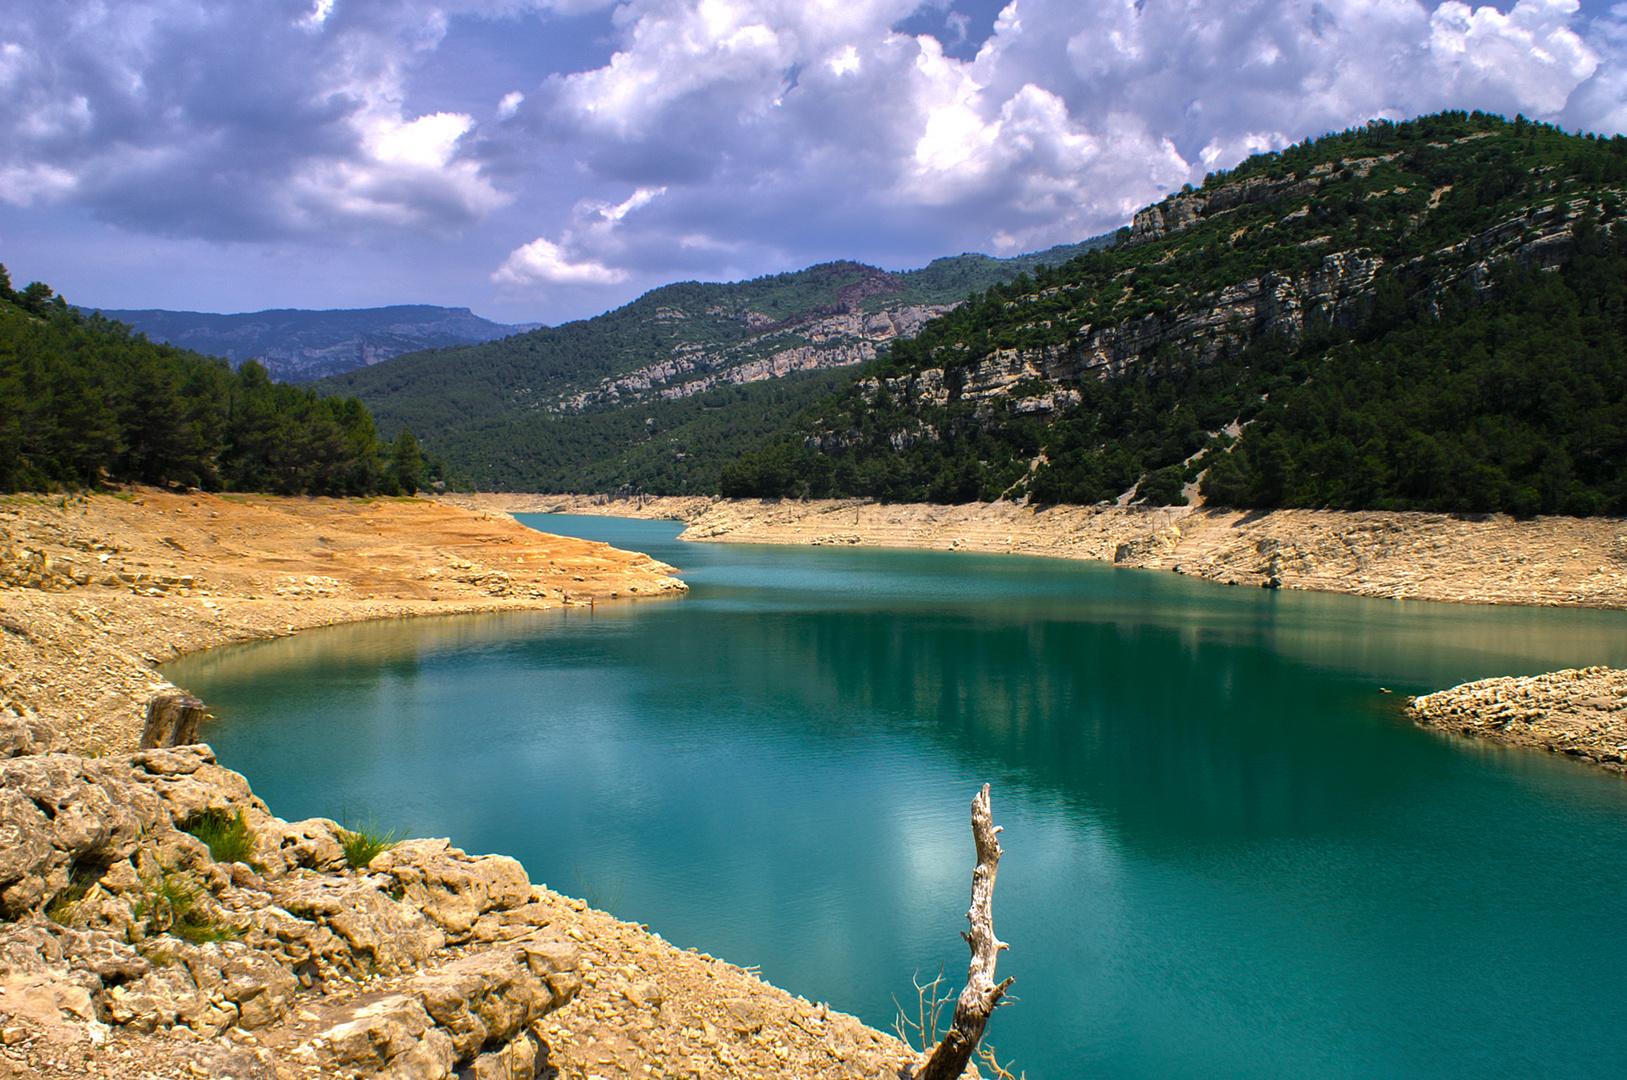 Stausee in Spanien nahe Ulldecona...